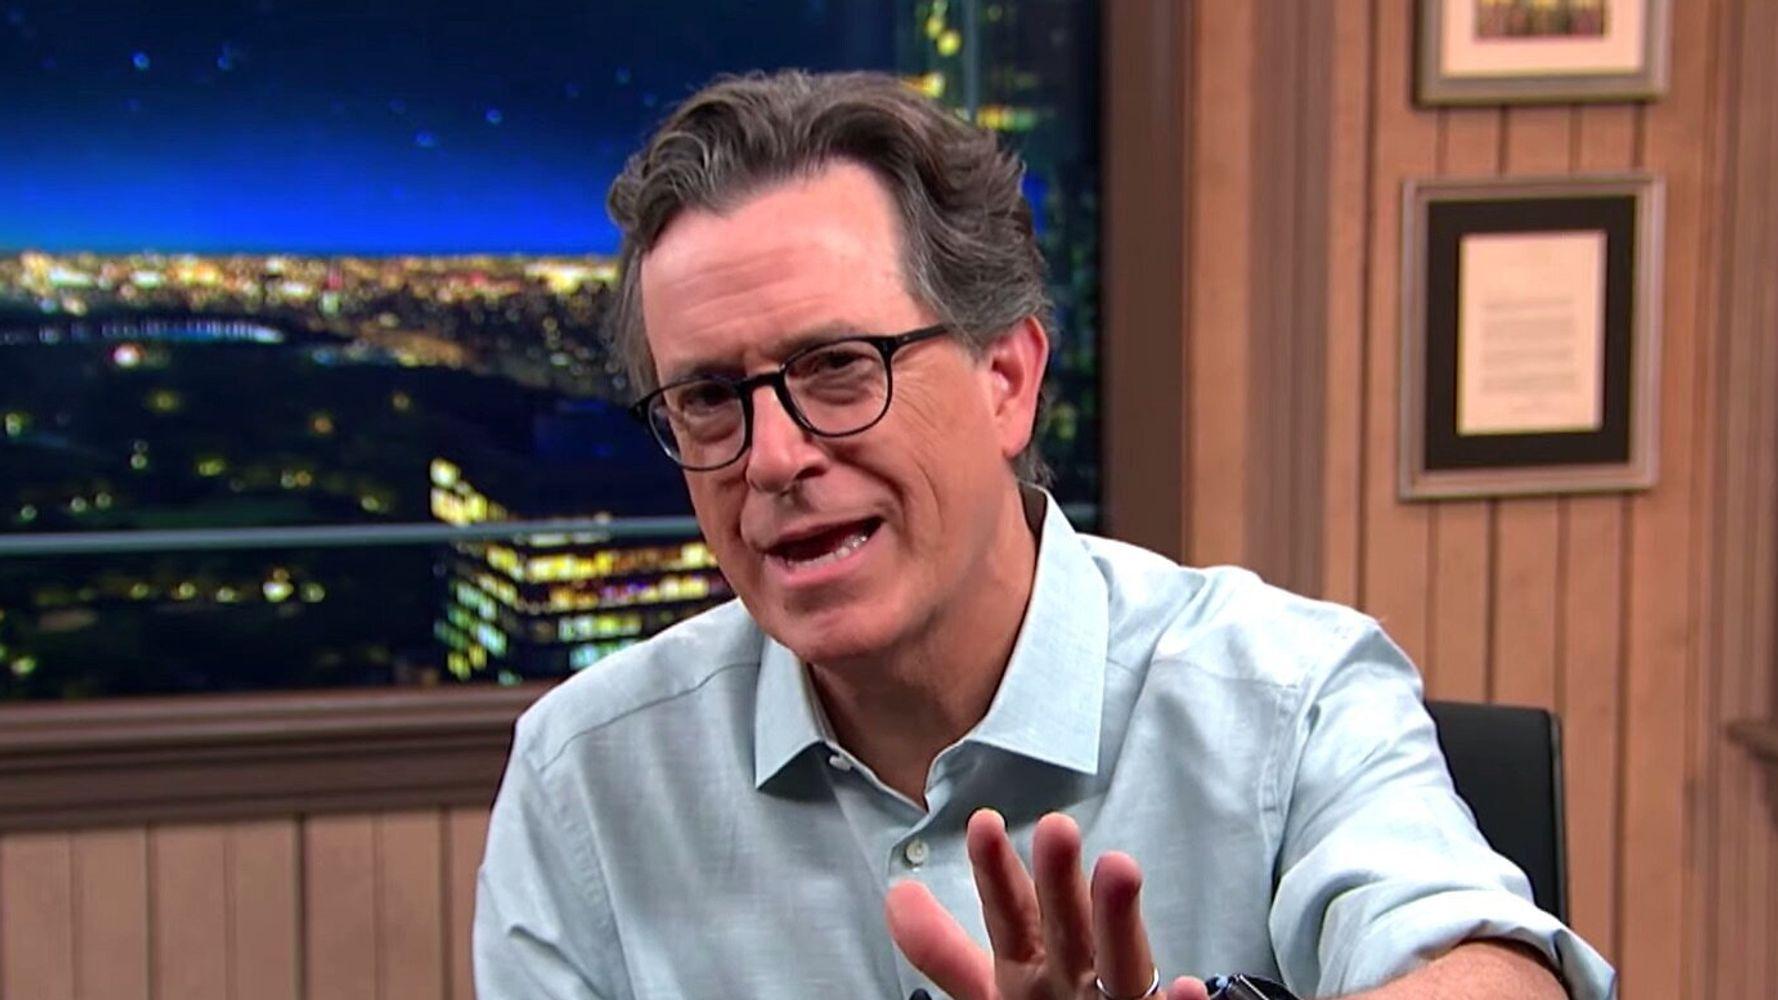 Stephen Colbert Trolls Trump's Latest Brain Fart: 'Did He Just Forget The Word 'Virus?''